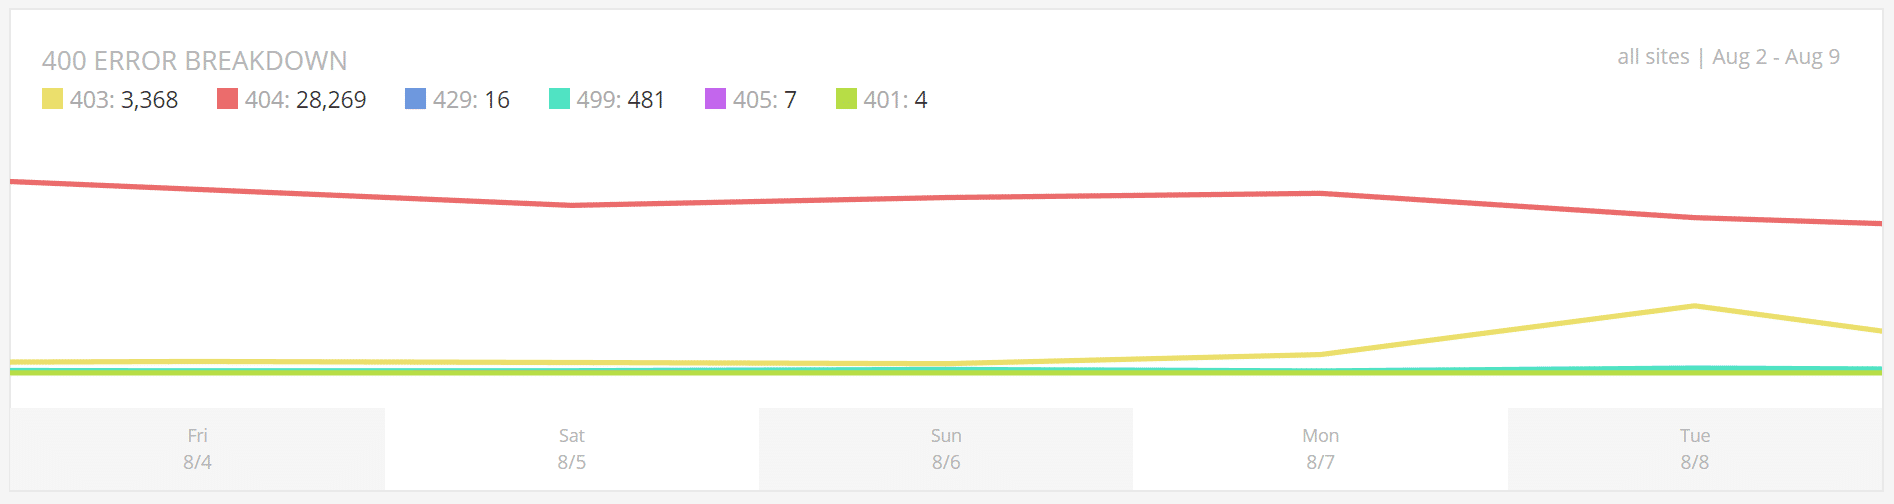 Response Analysis - 400 error breakdown